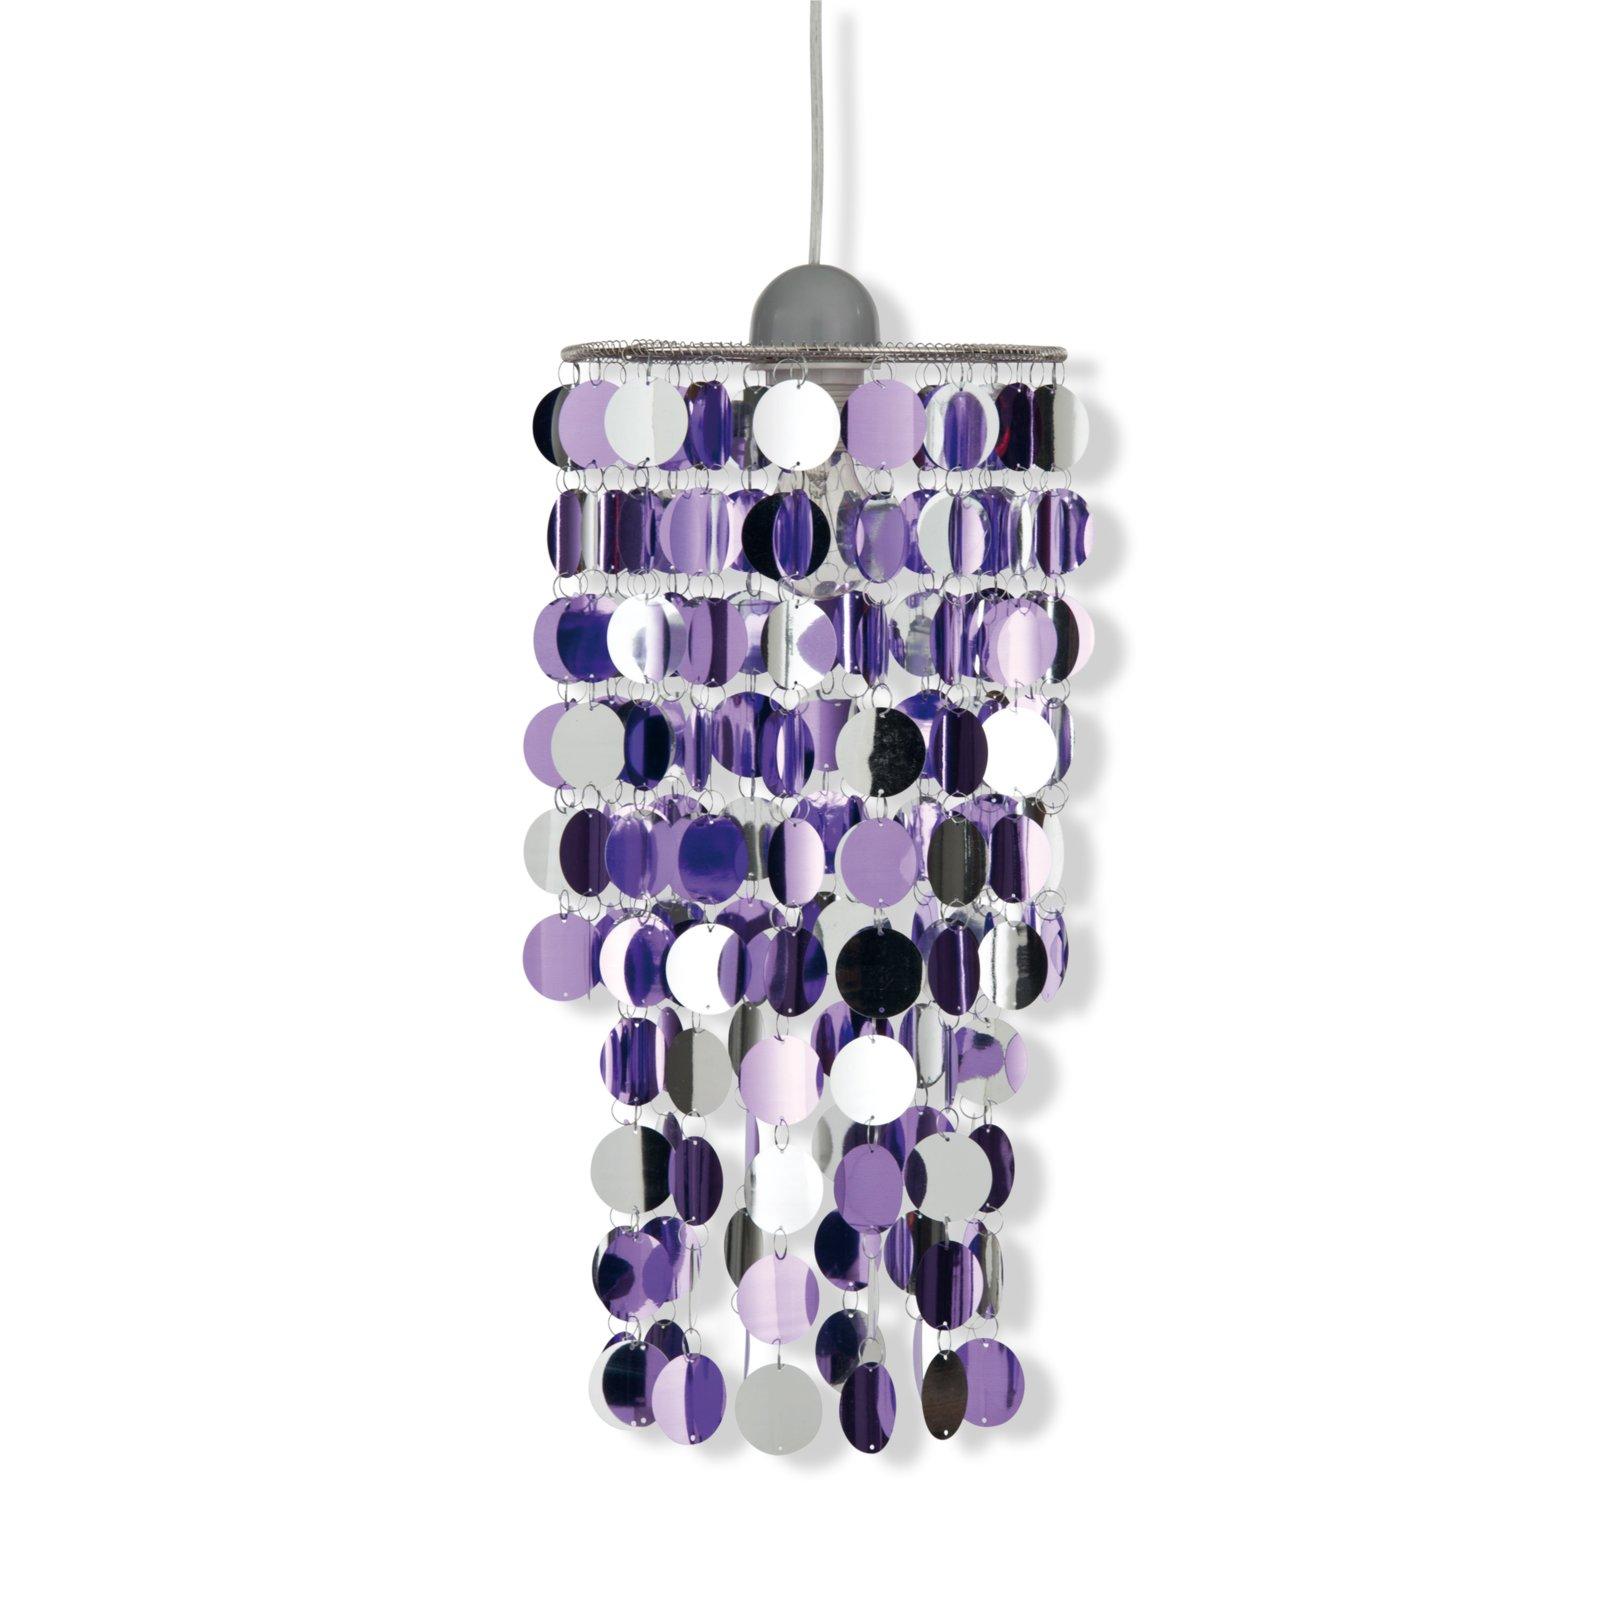 pendelleuchte fancy pailletten lila pendelleuchten. Black Bedroom Furniture Sets. Home Design Ideas